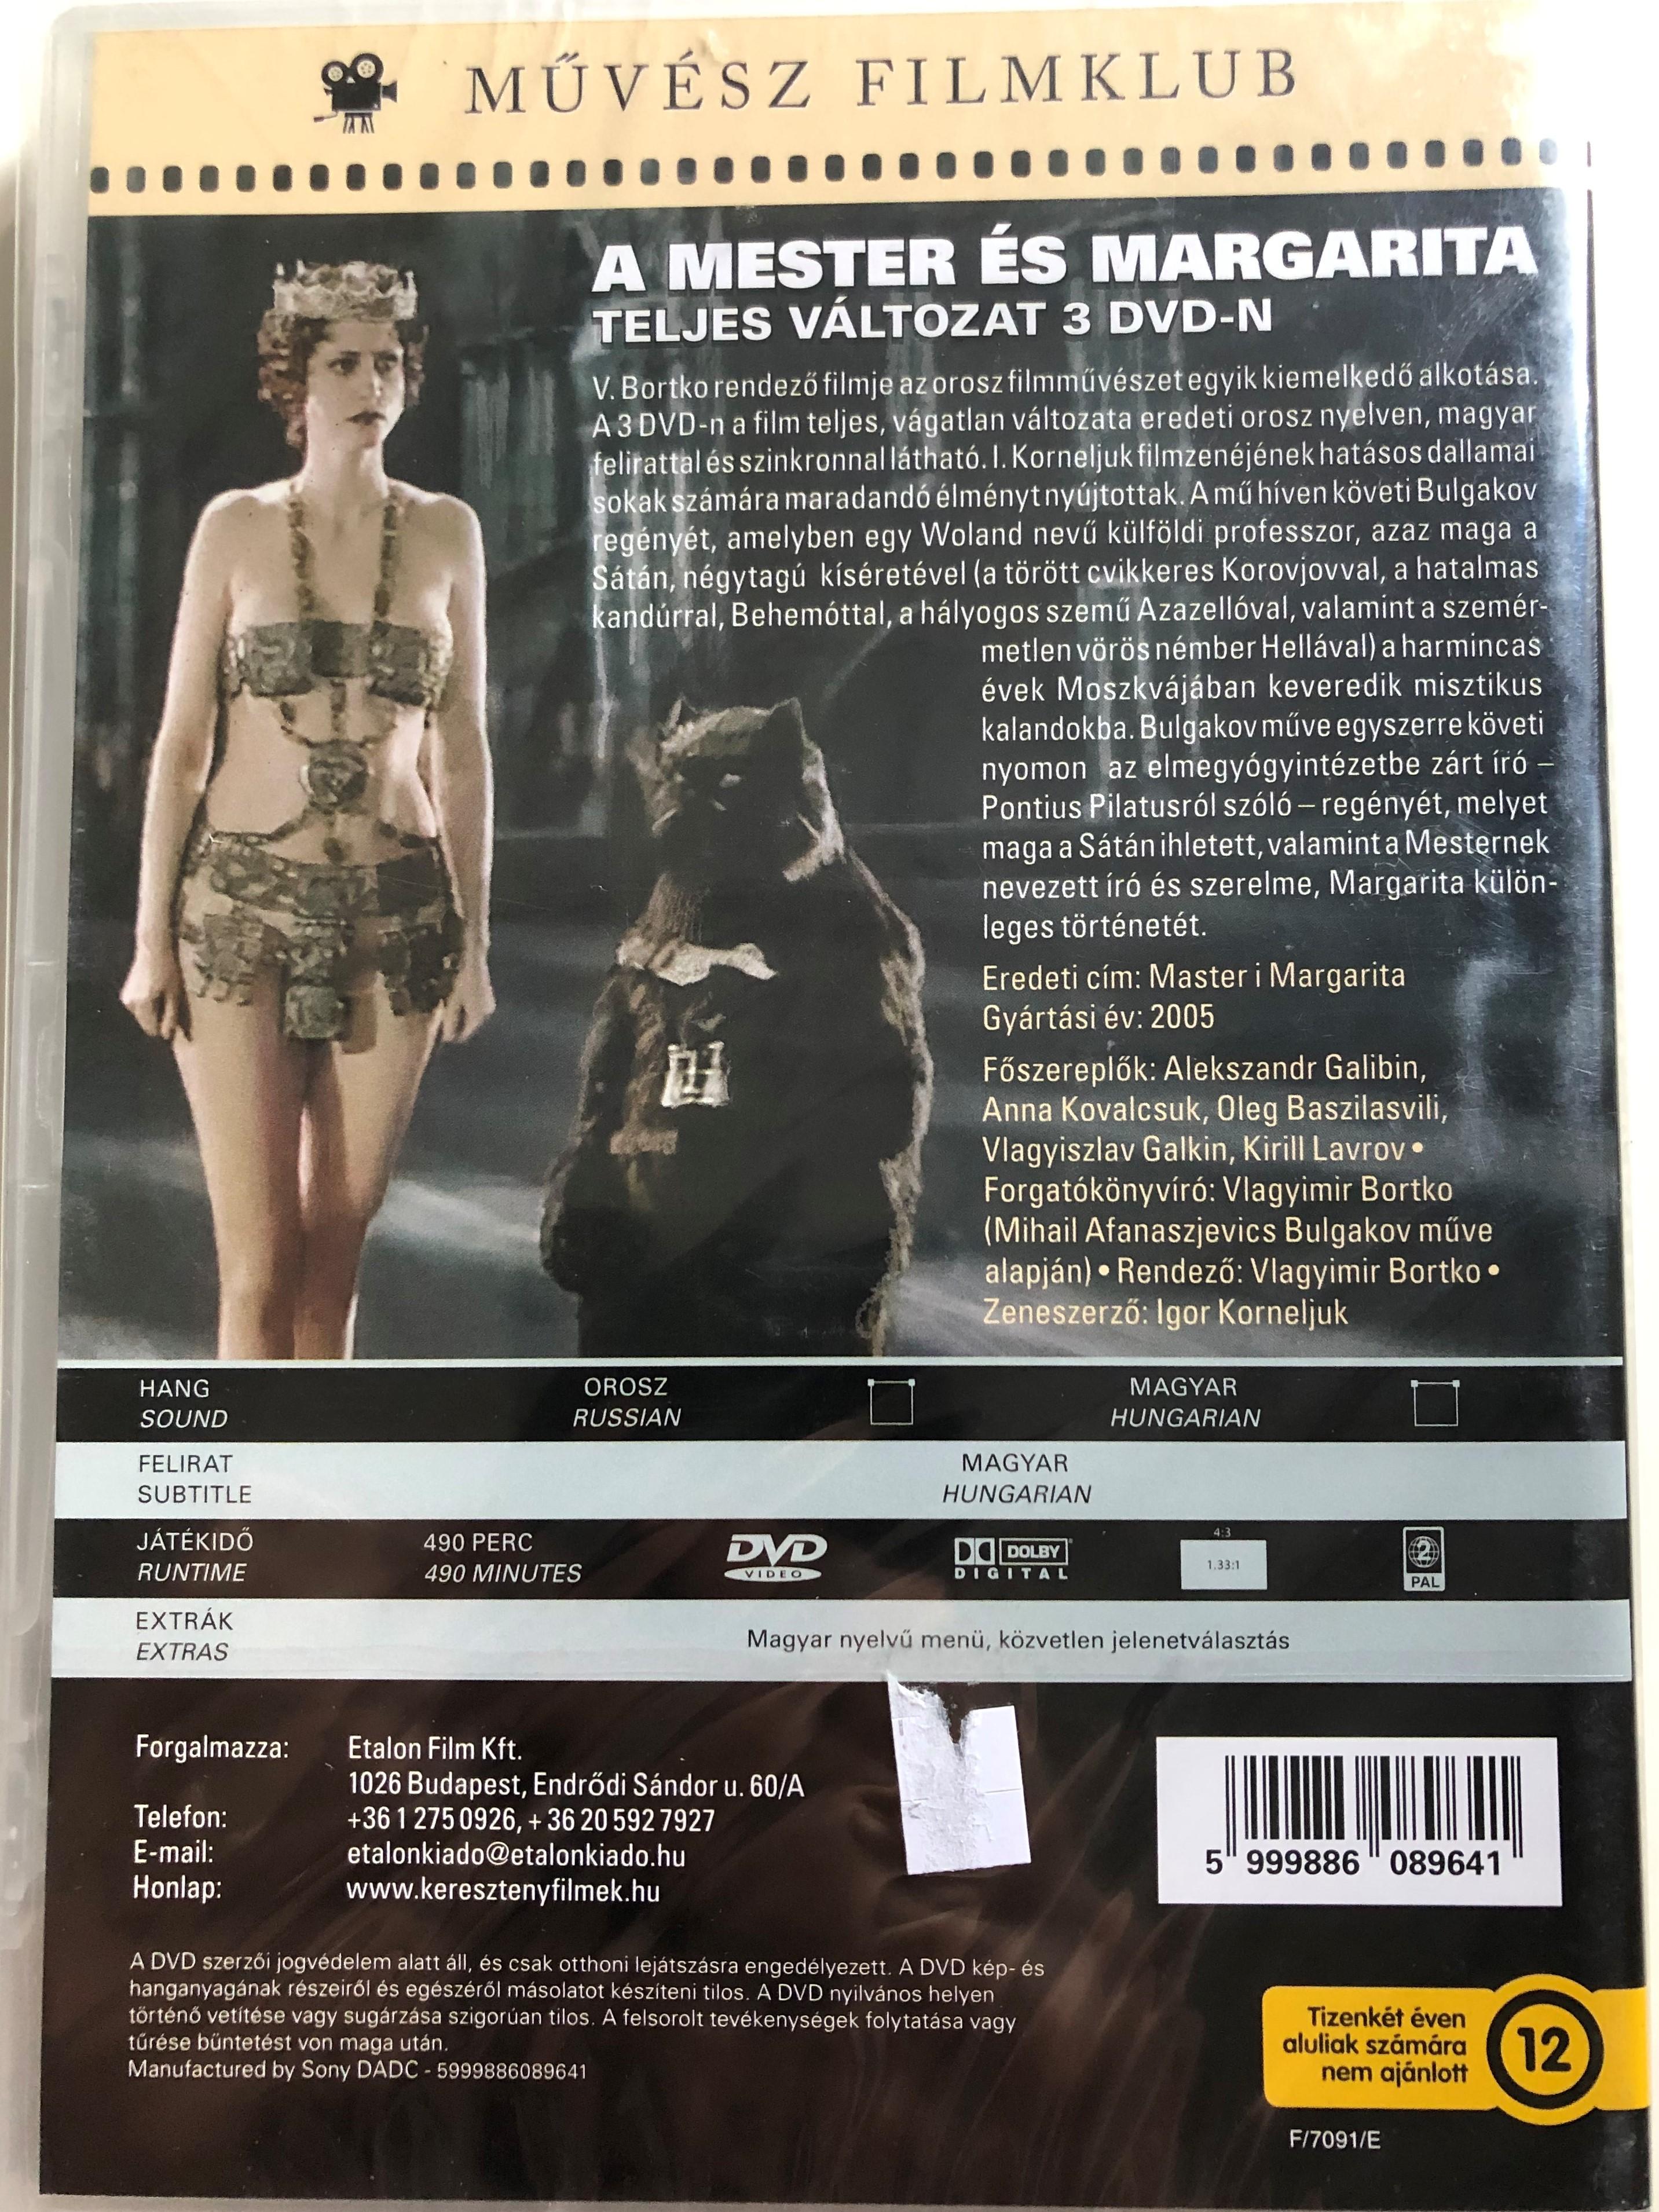 master-i-margarita-dvd-2005-a-mester-s-margarita-directed-by-vladimir-bortko-2.jpg